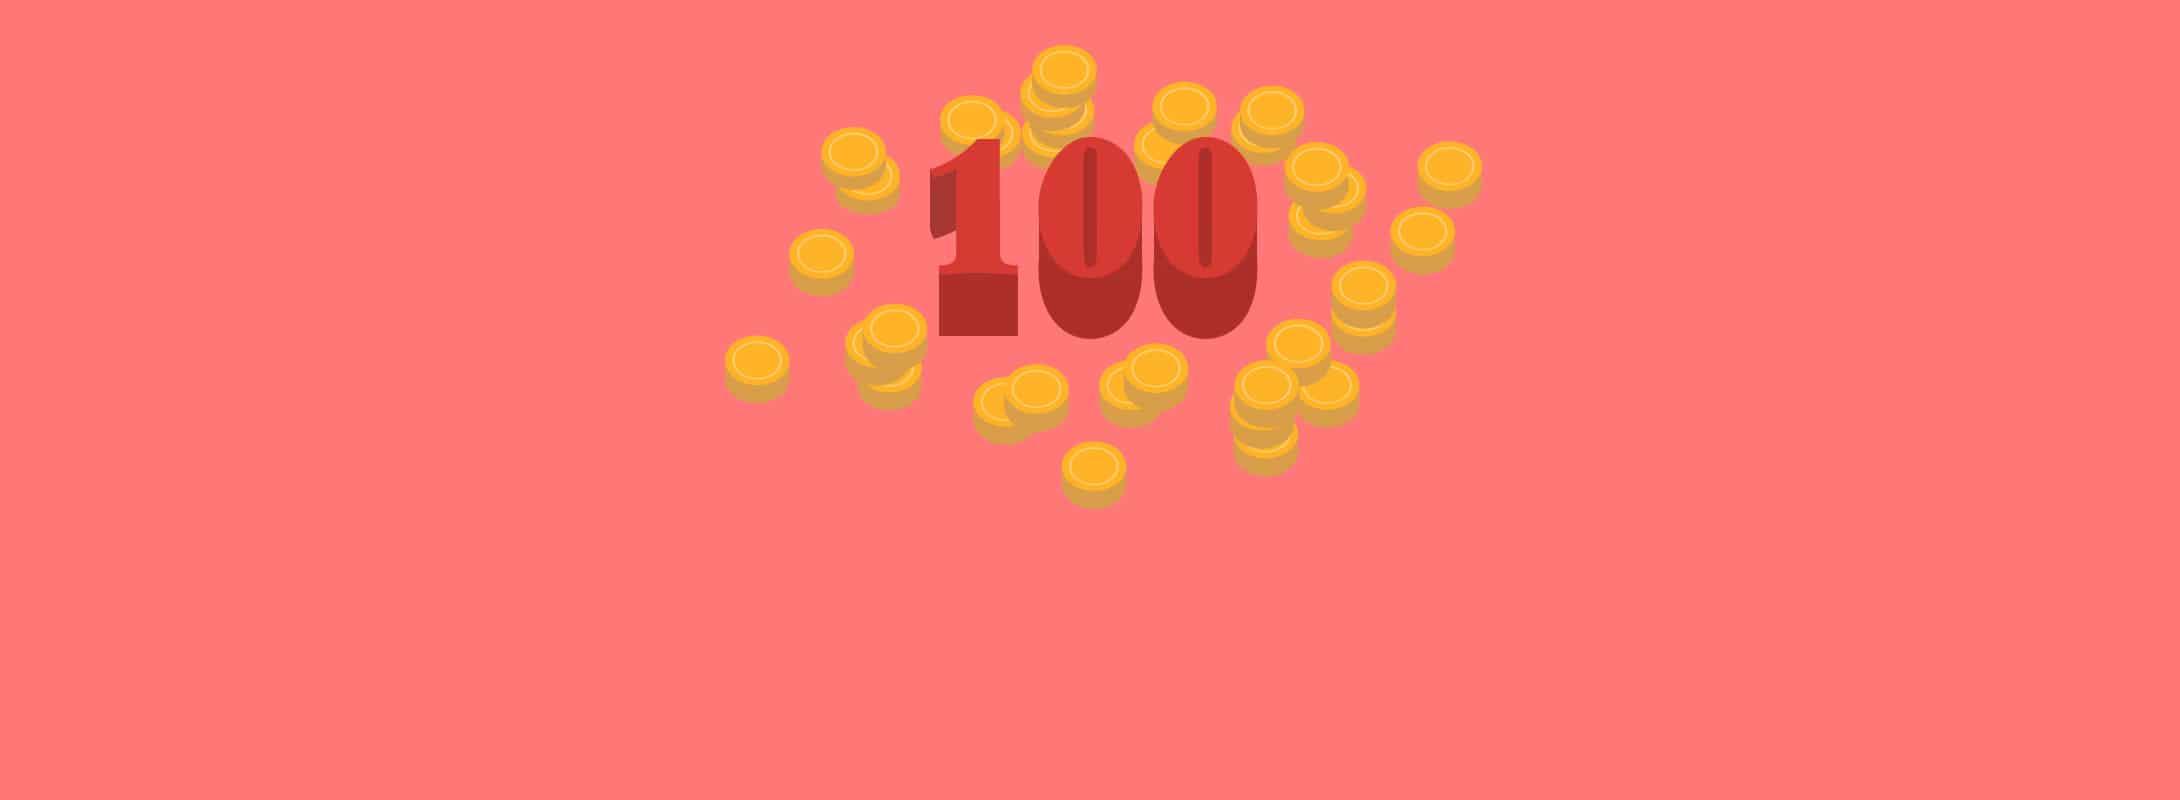 Hazte con las 100 Tiradas Gratis de Merkurmagic Casino